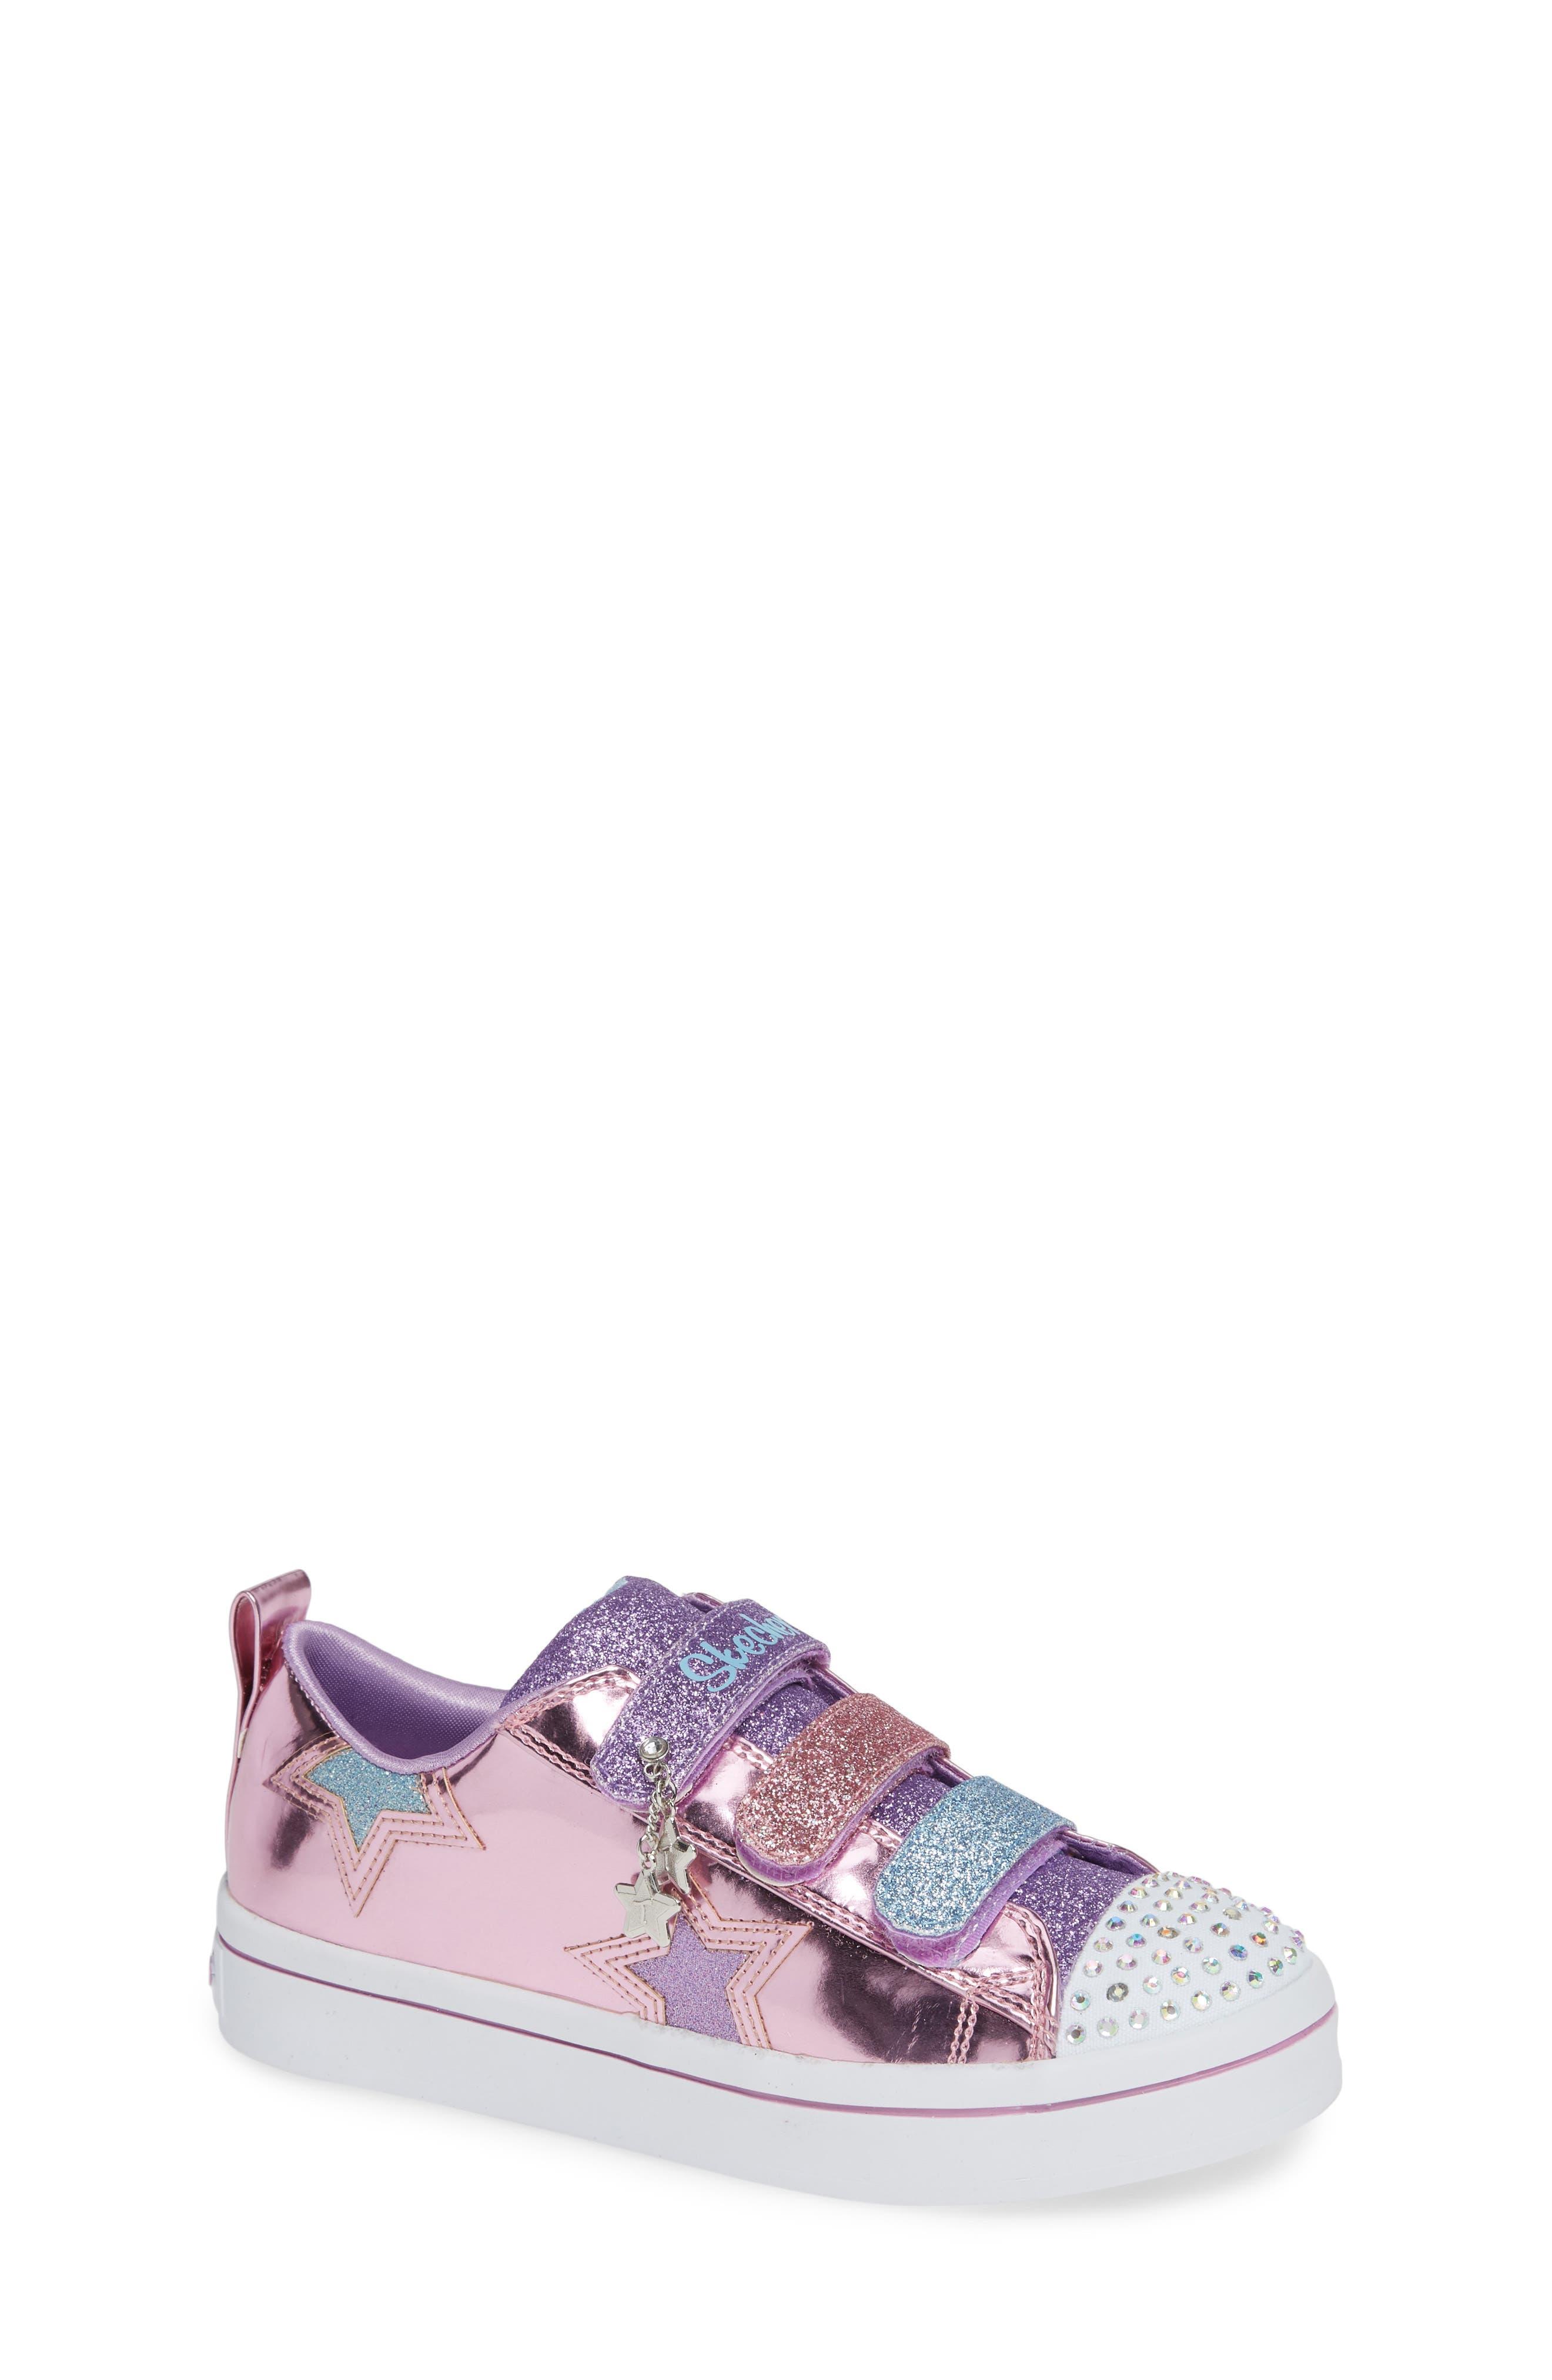 Twi-Lites Star Light-Up Sneaker,                         Main,                         color, PINK/ MULTI